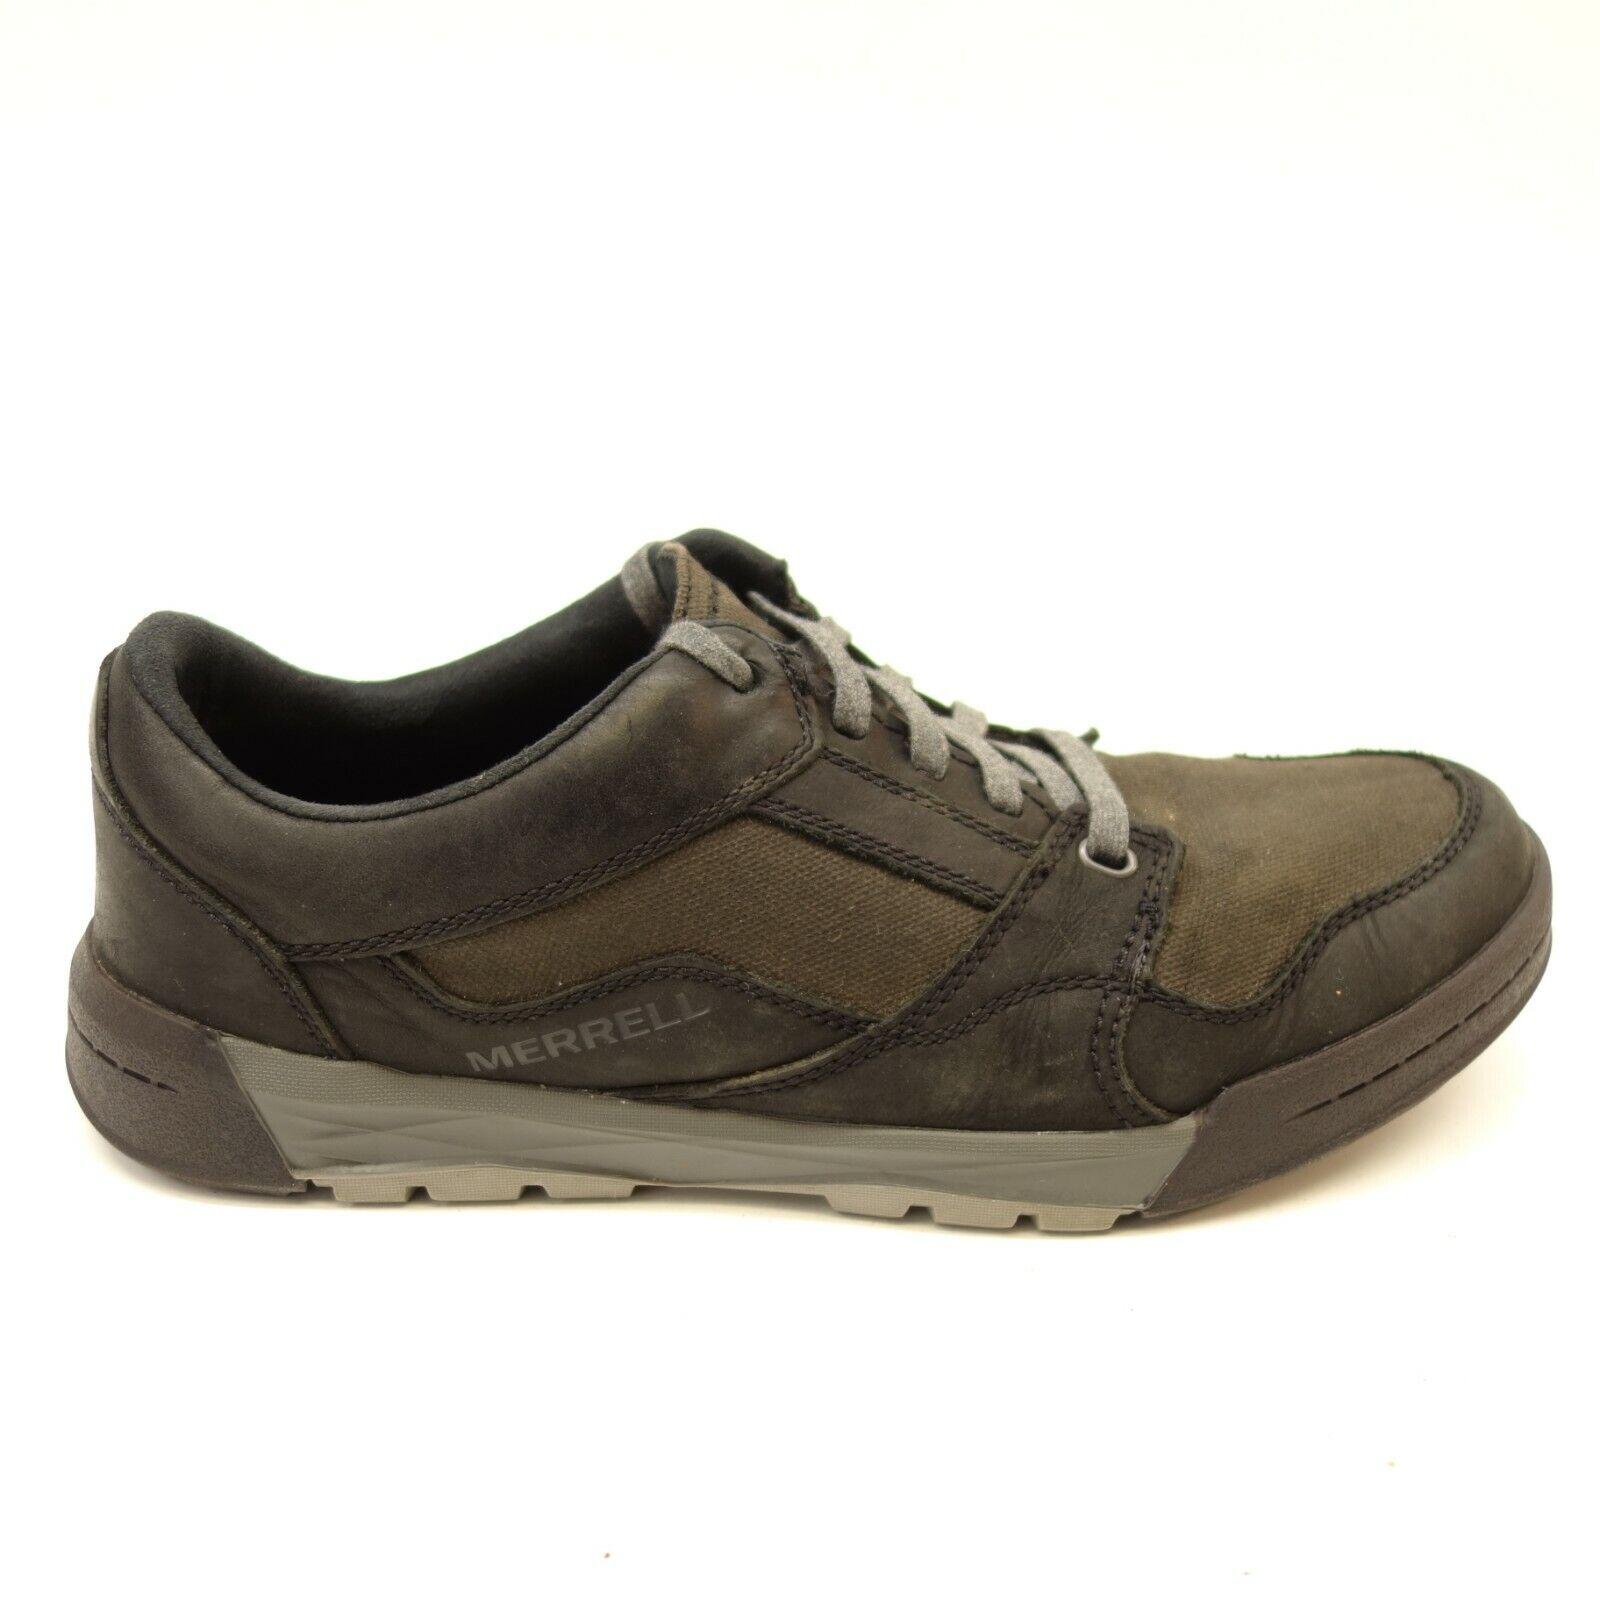 Merrell Uomo Berner nero Shift Lace Leather Athletic Trail Trail Trail Hiking scarpe Dimensione 10 8a71a7